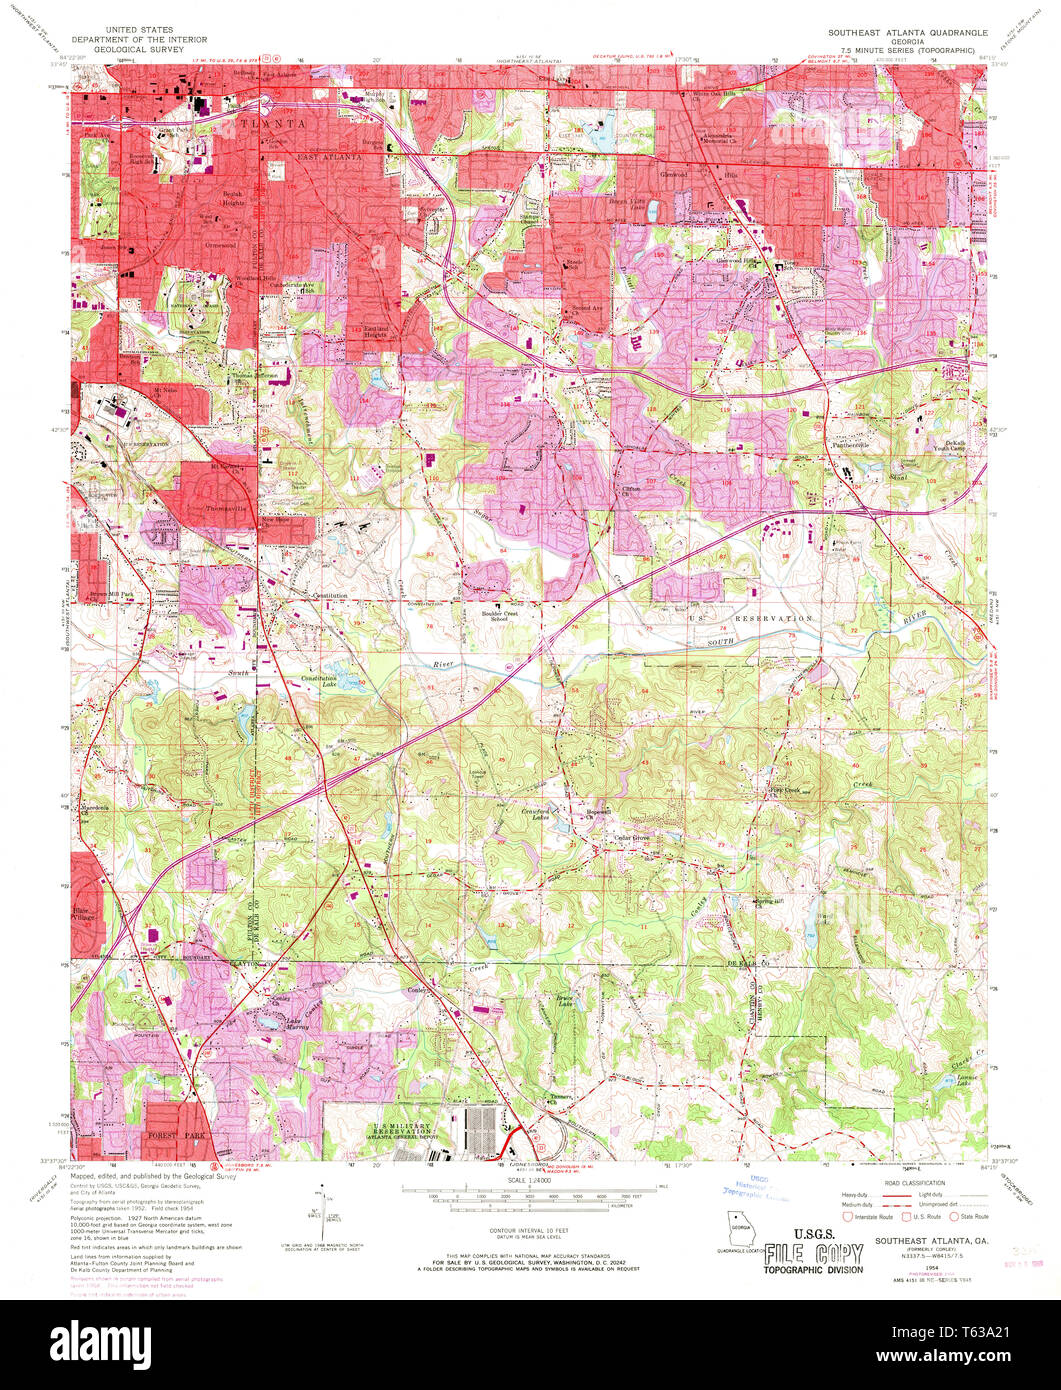 USGS TOPO Map Georgia GA Southeast Atlanta 246962 1954 24000 ... Map Of Southeast Ga on map of southeast texas, map of southeast kentucky, map of southeast ak, map of southeast la, map of southeast ct, map of southeast coast of us, map of southeast us states, map of southeast cu, map of southern georgia, map of southeast new jersey, map of southeast nm, map of southeast usa, map of southeast florida cities, map of southeast wi, map of southeast canada, map of southeast new york, map of south georgia, map of southeast missouri, map of southeast georgia cities, map of southeast wy,